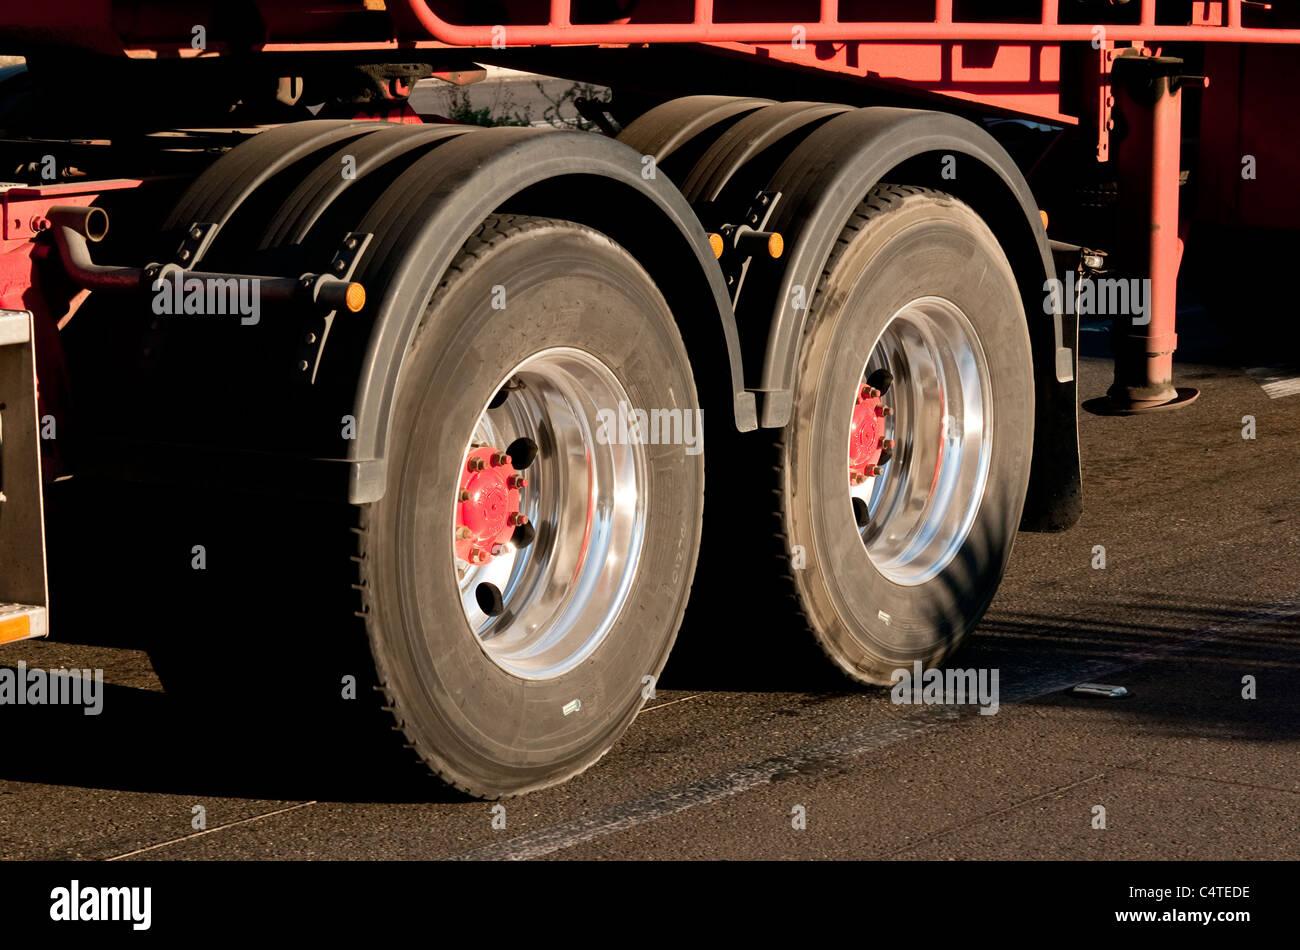 Double Rear Wheels Stock Photos & Double Rear Wheels Stock